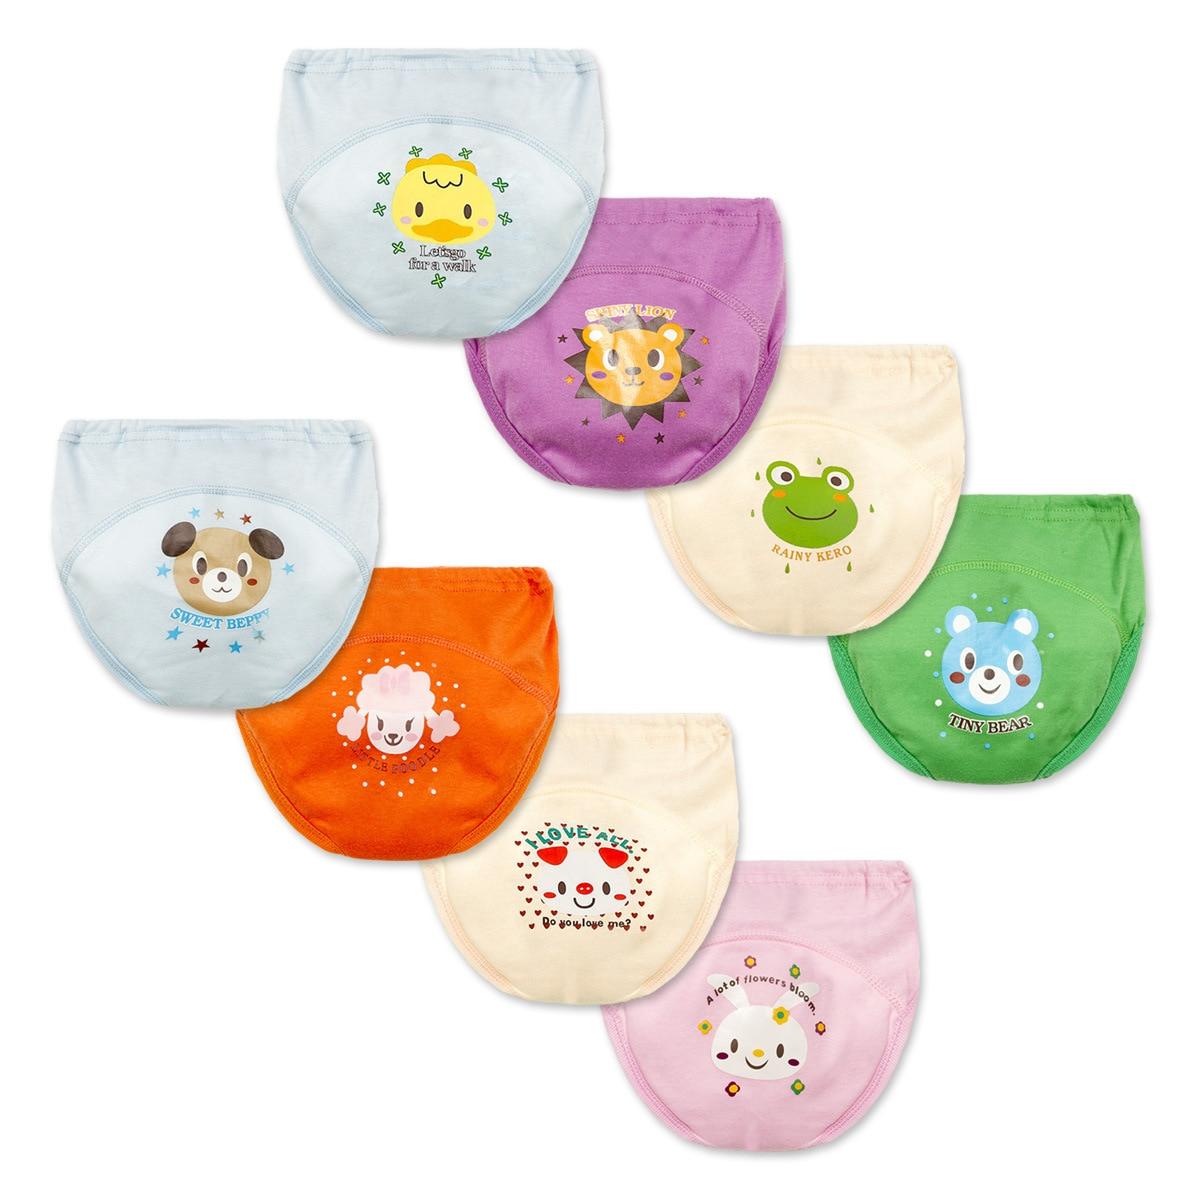 Infant Diaper Panties Training Underwear Toddler Boys Girl Cartoon Waterproof Baby Panties New Born Cotton Briefs Boys Underwear